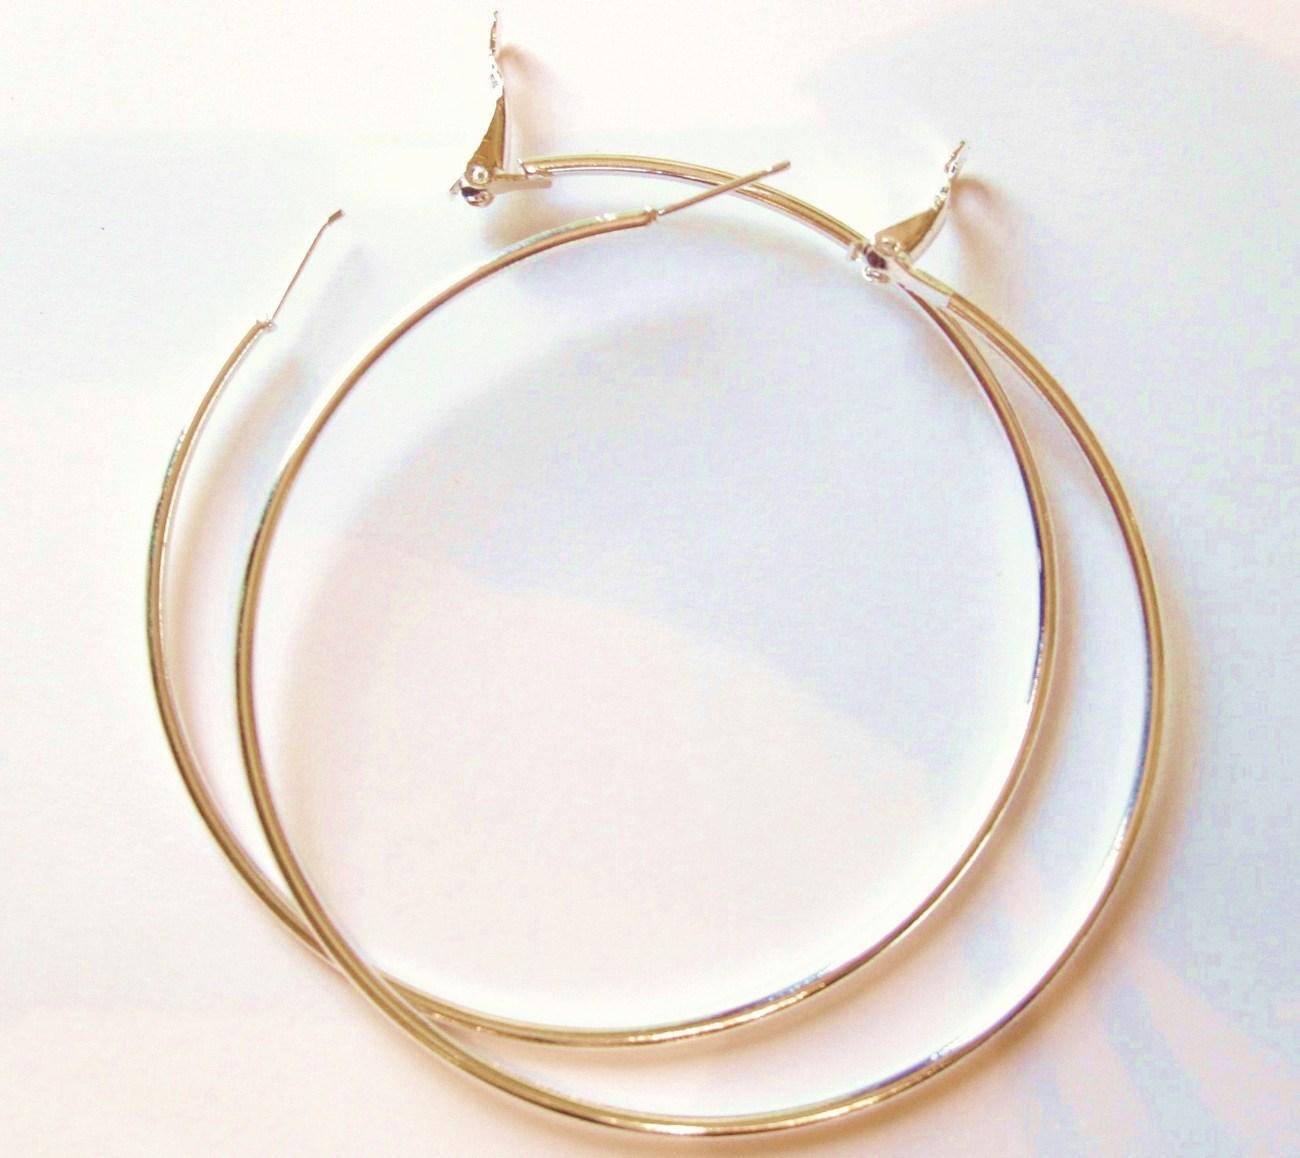 Ea83 jumbo gold hoop 9cm 3.5 in